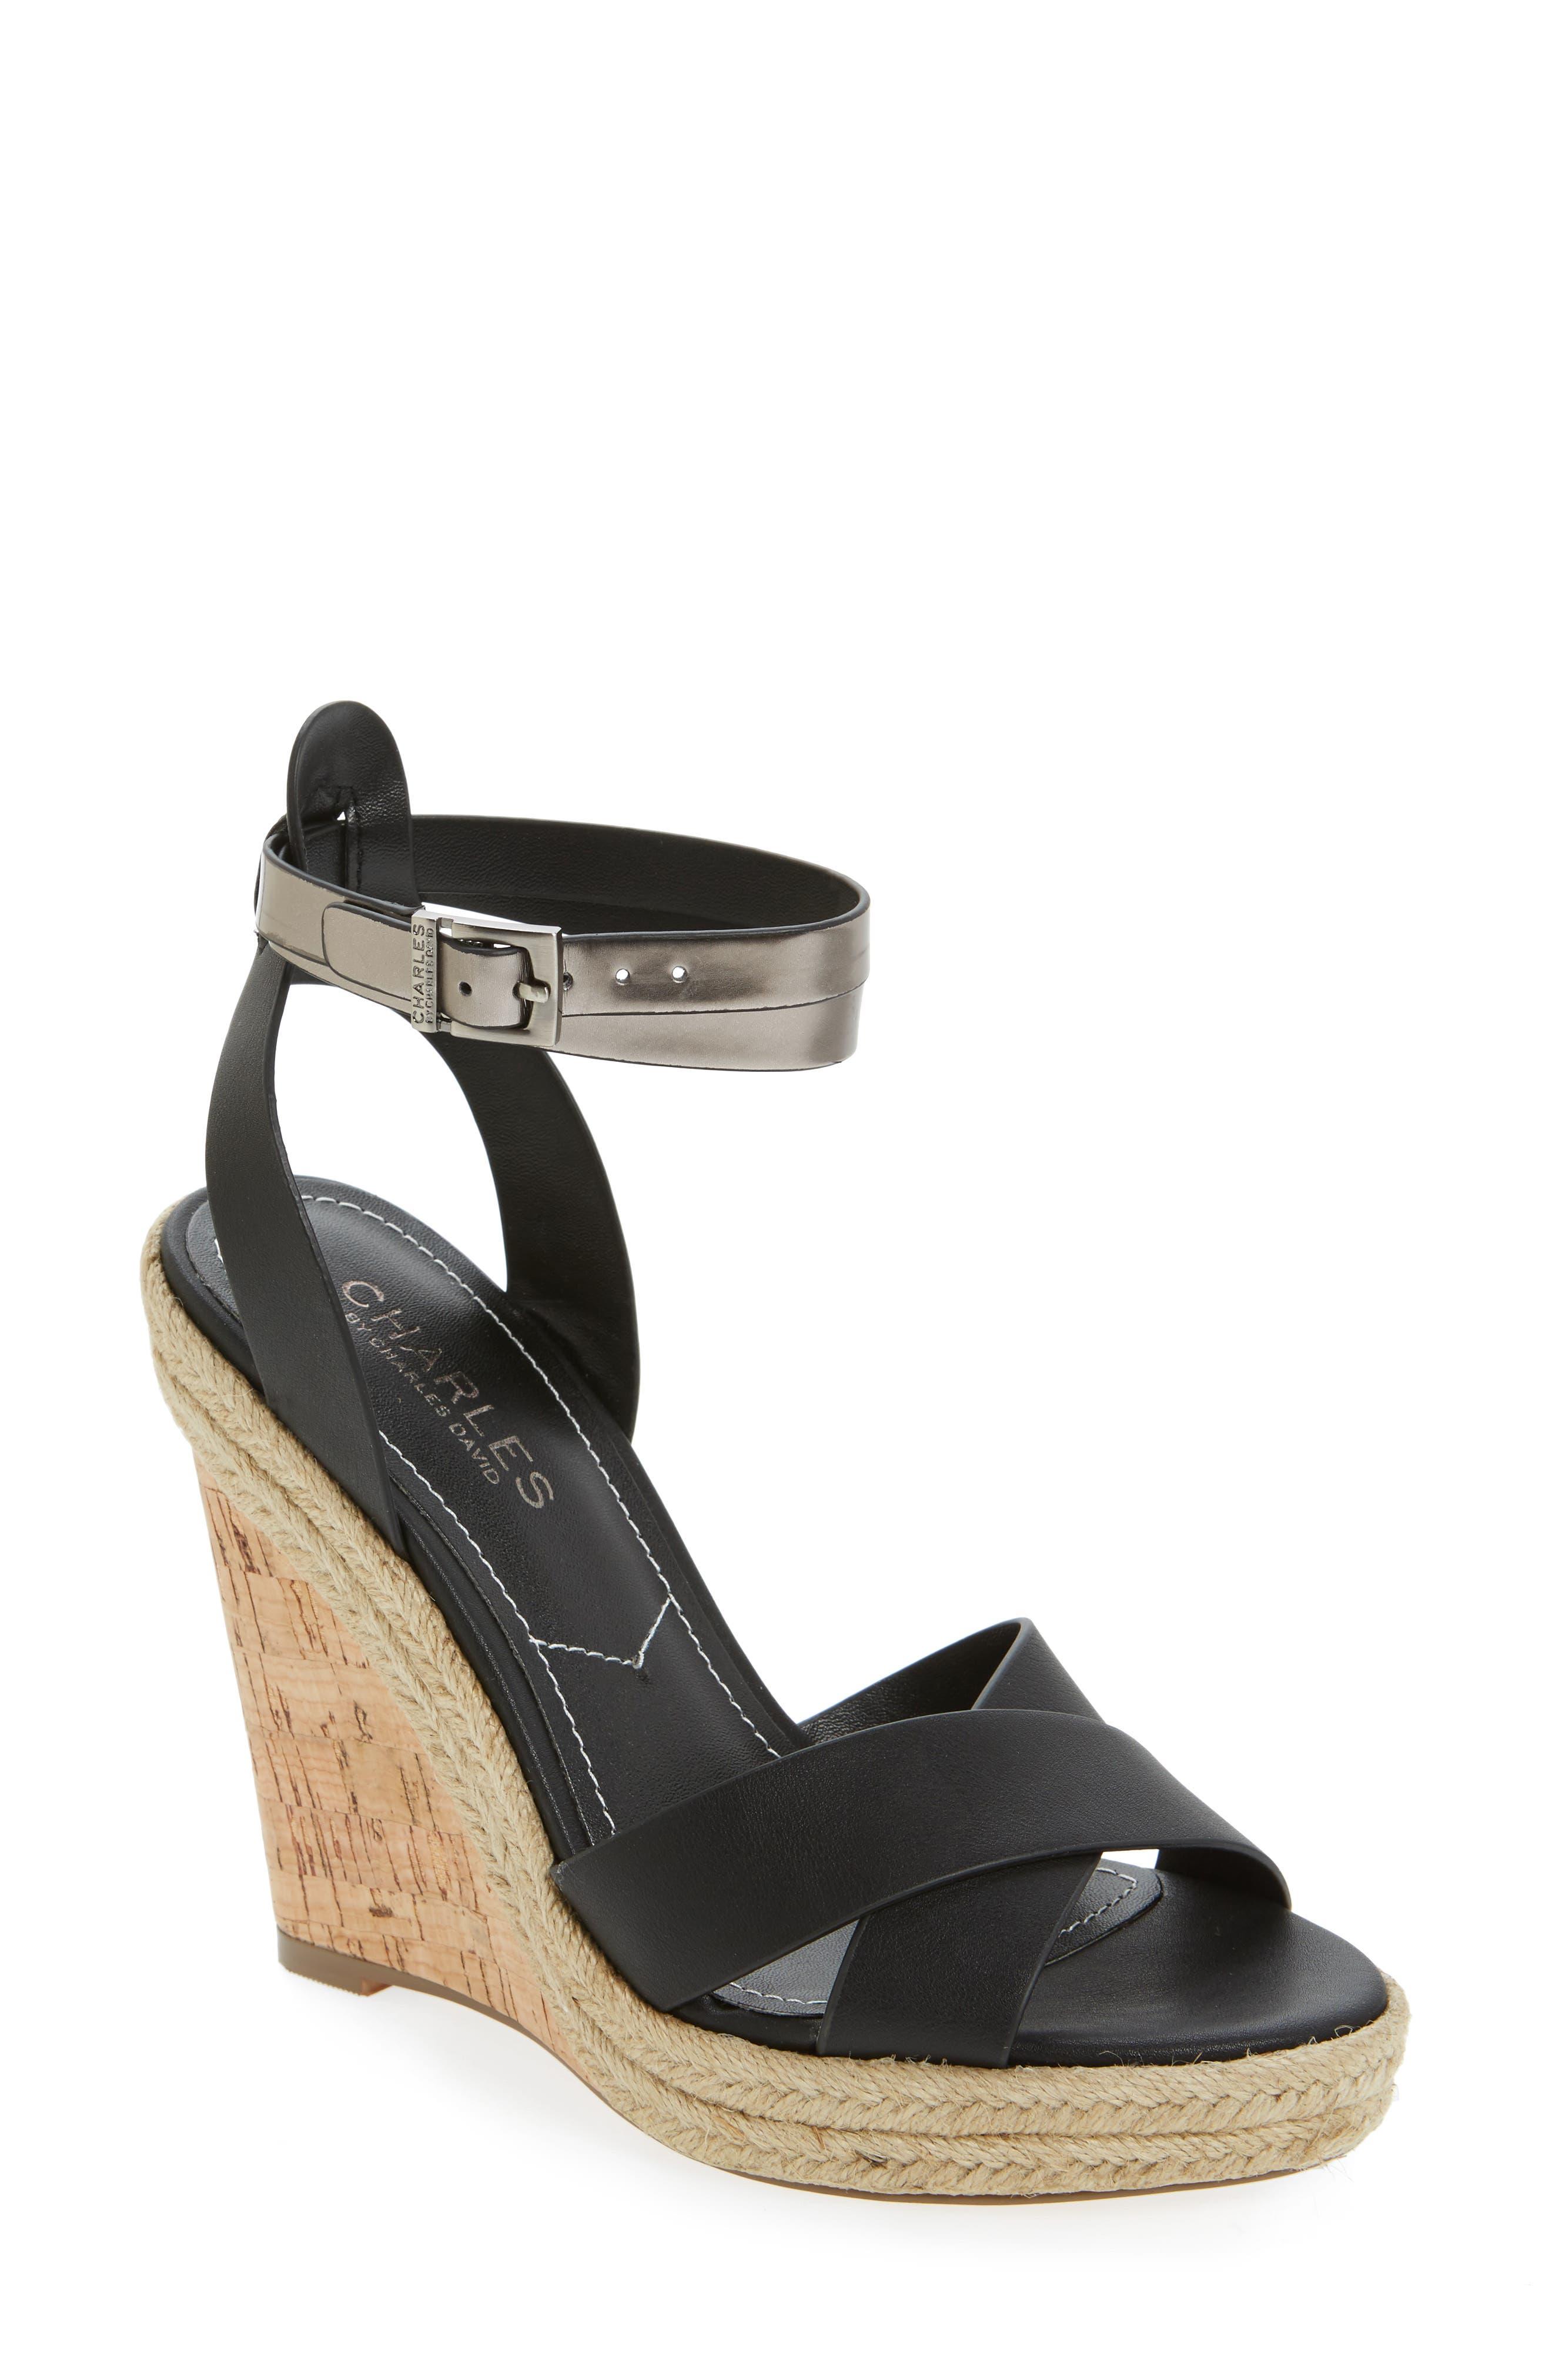 Alternate Image 1 Selected - Charles by Charles David Brit Wedge Platform Sandal (Women)